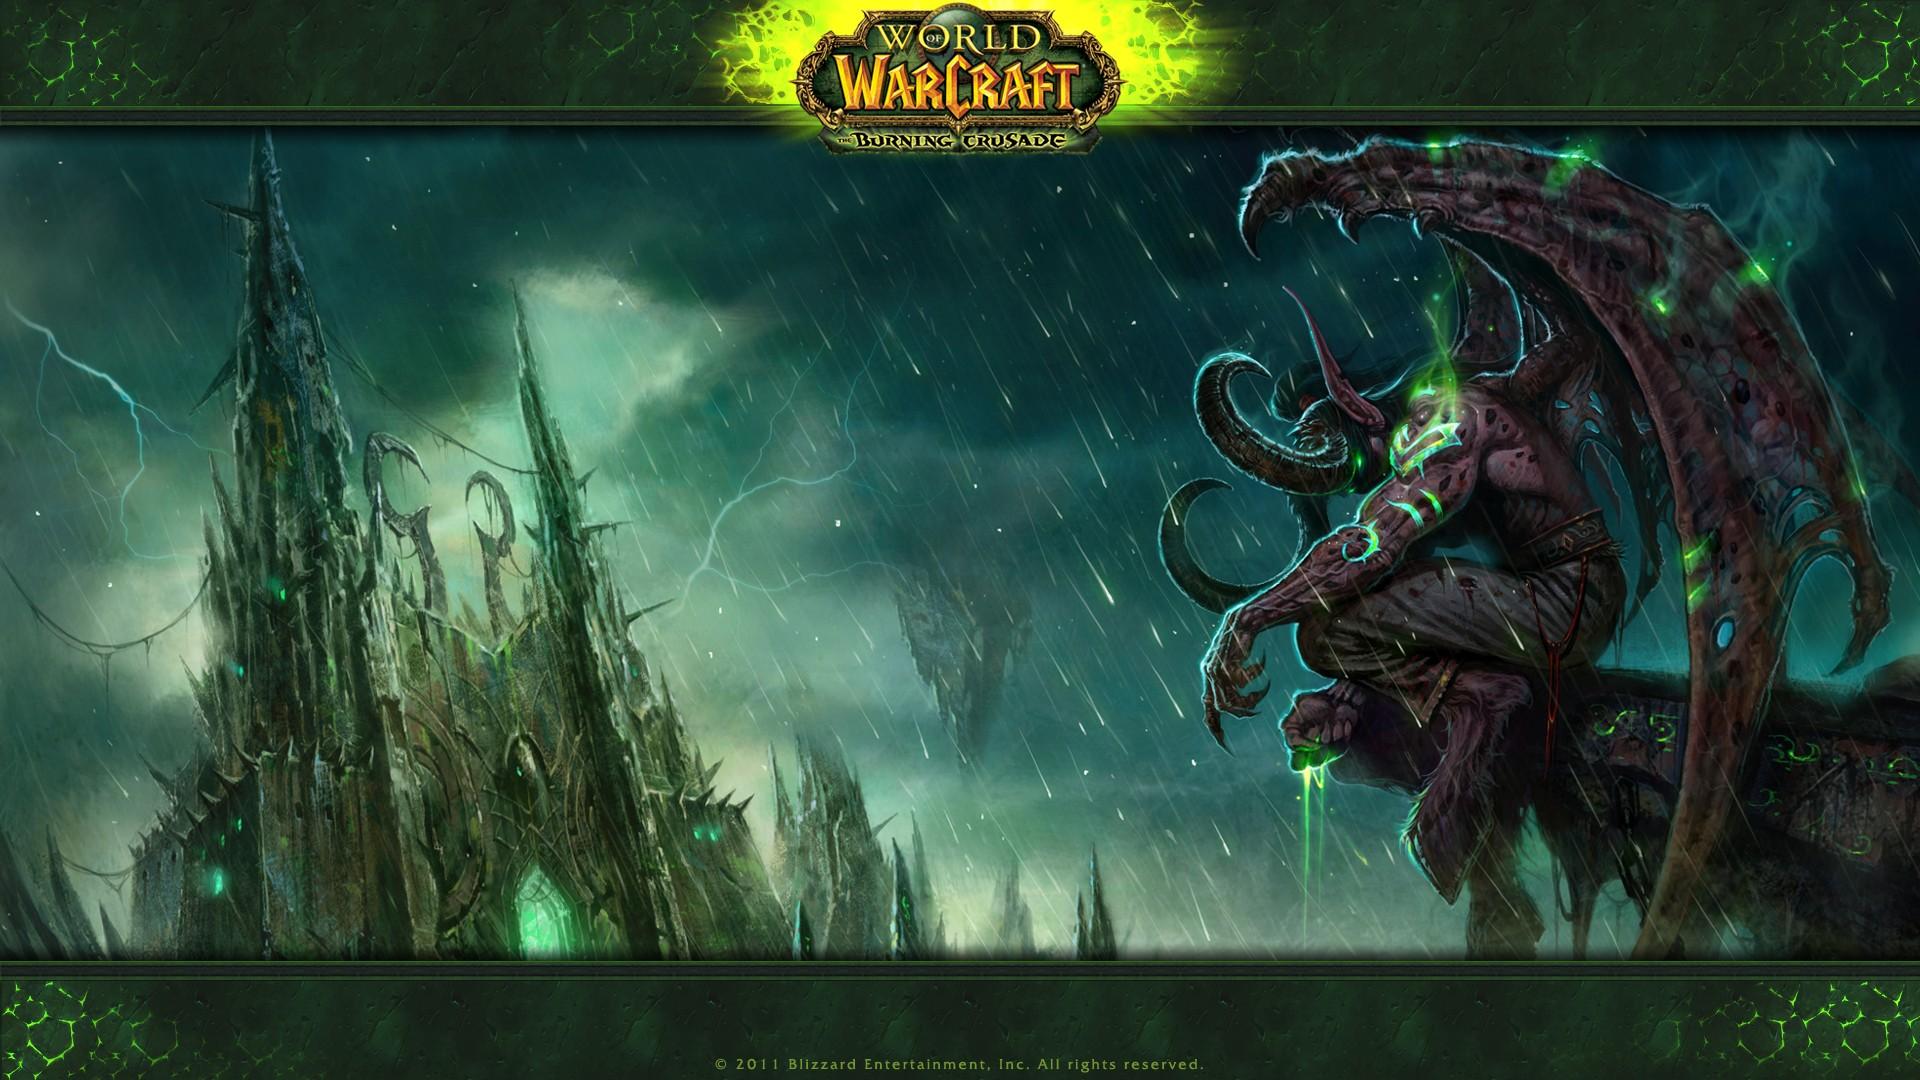 General 1920x1080 World of Warcraft World of Warcraft: The Burning Crusade Illidan Stormrage video games